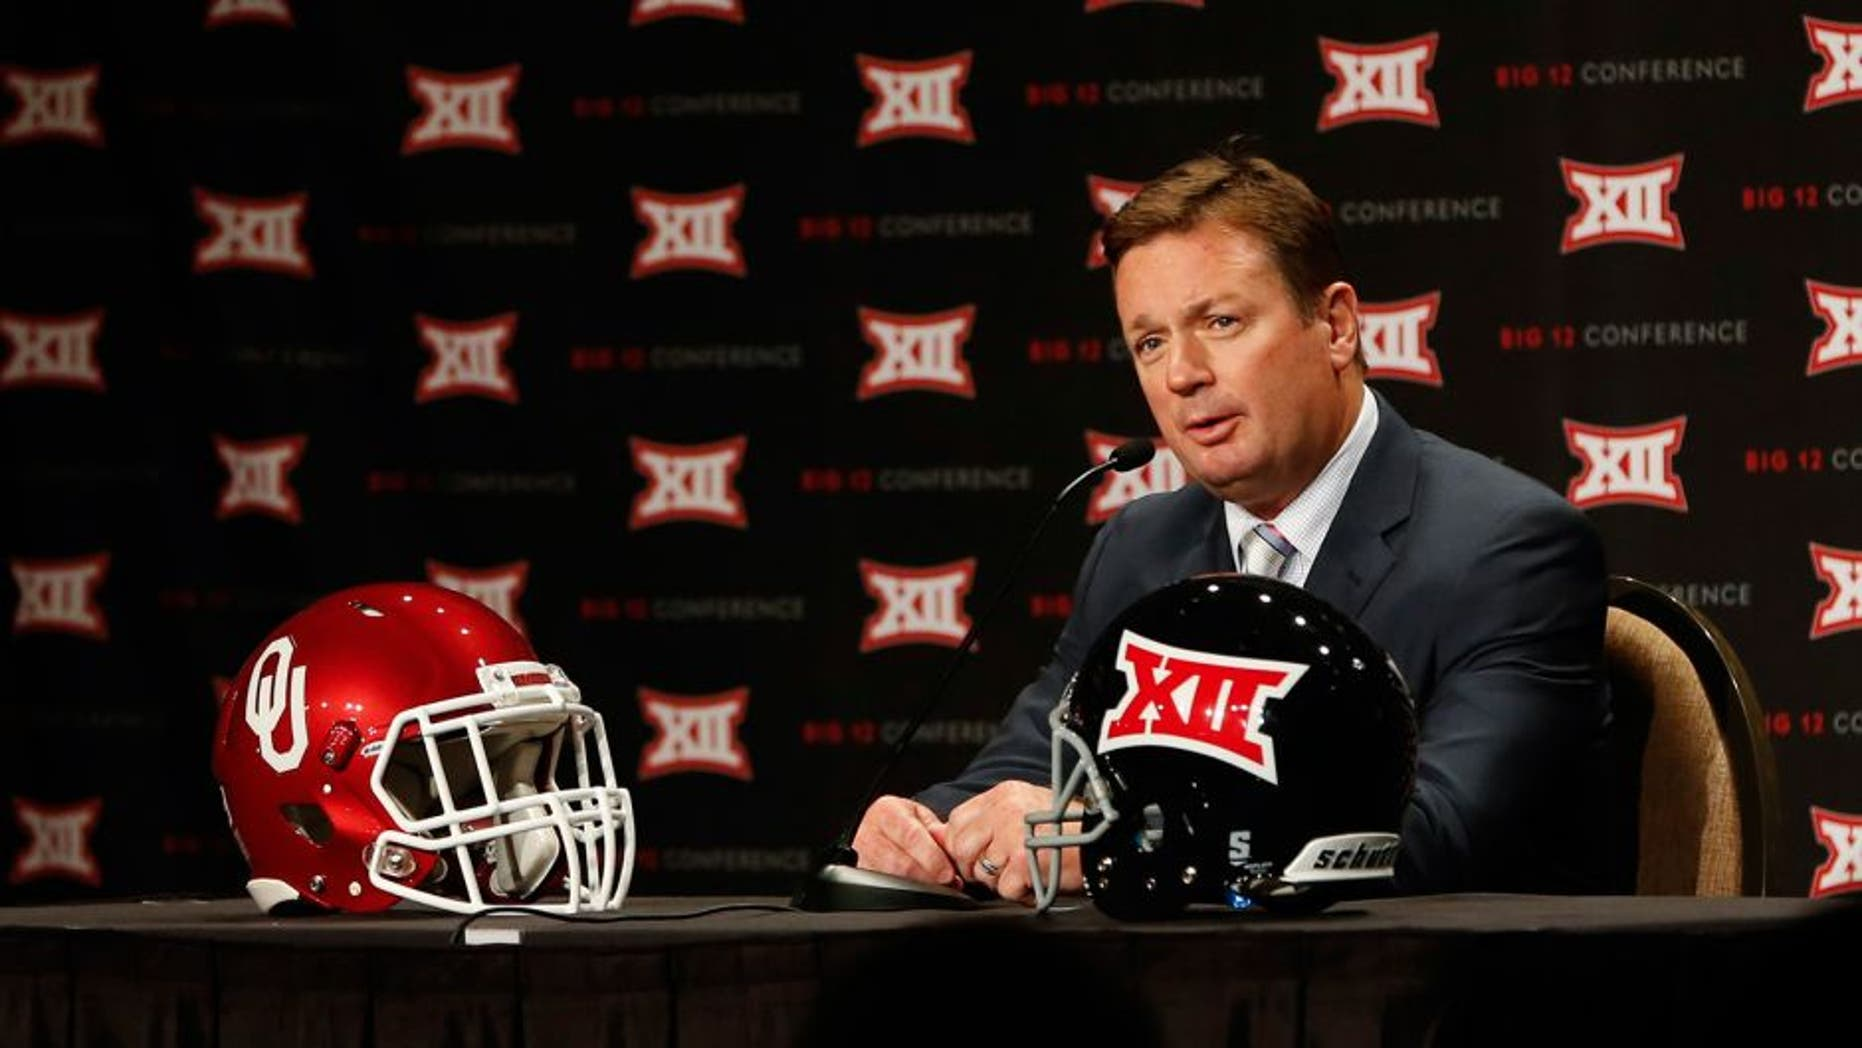 Jul 22, 2014; Dallas, TX, USA; Oklahoma Sooners head coach Bob Stoops speaks to the media during the Big 12 Media Day at the Omni Dallas. Mandatory Credit: Kevin Jairaj-USA TODAY Sports